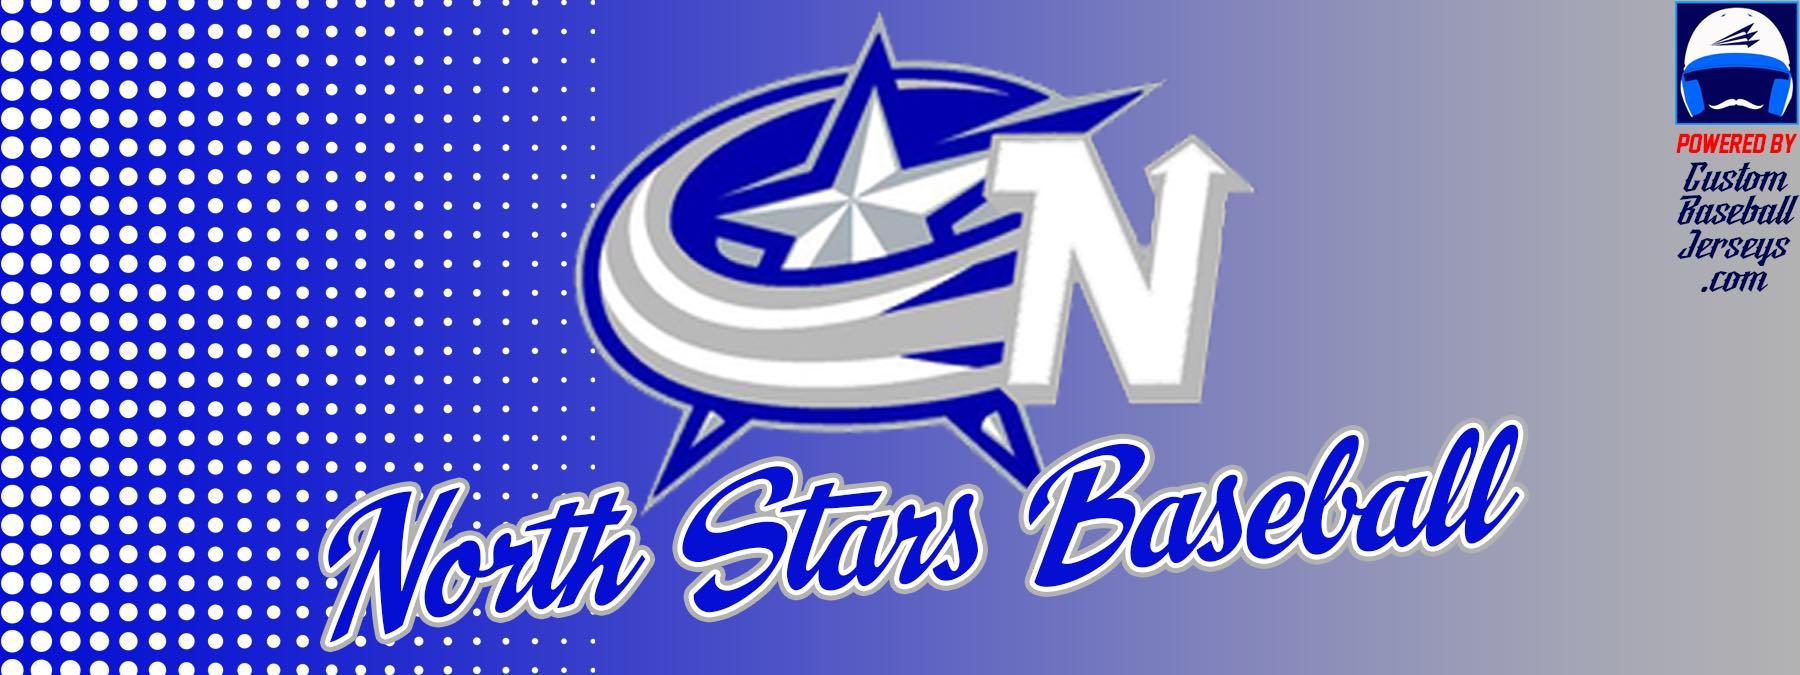 ec8b51588 North Stars (Warren) Custom Throwback Baseball Jerseys - Custom Baseball  Jerseys.com - The World s  1 Choice for Custom Baseball Uniforms